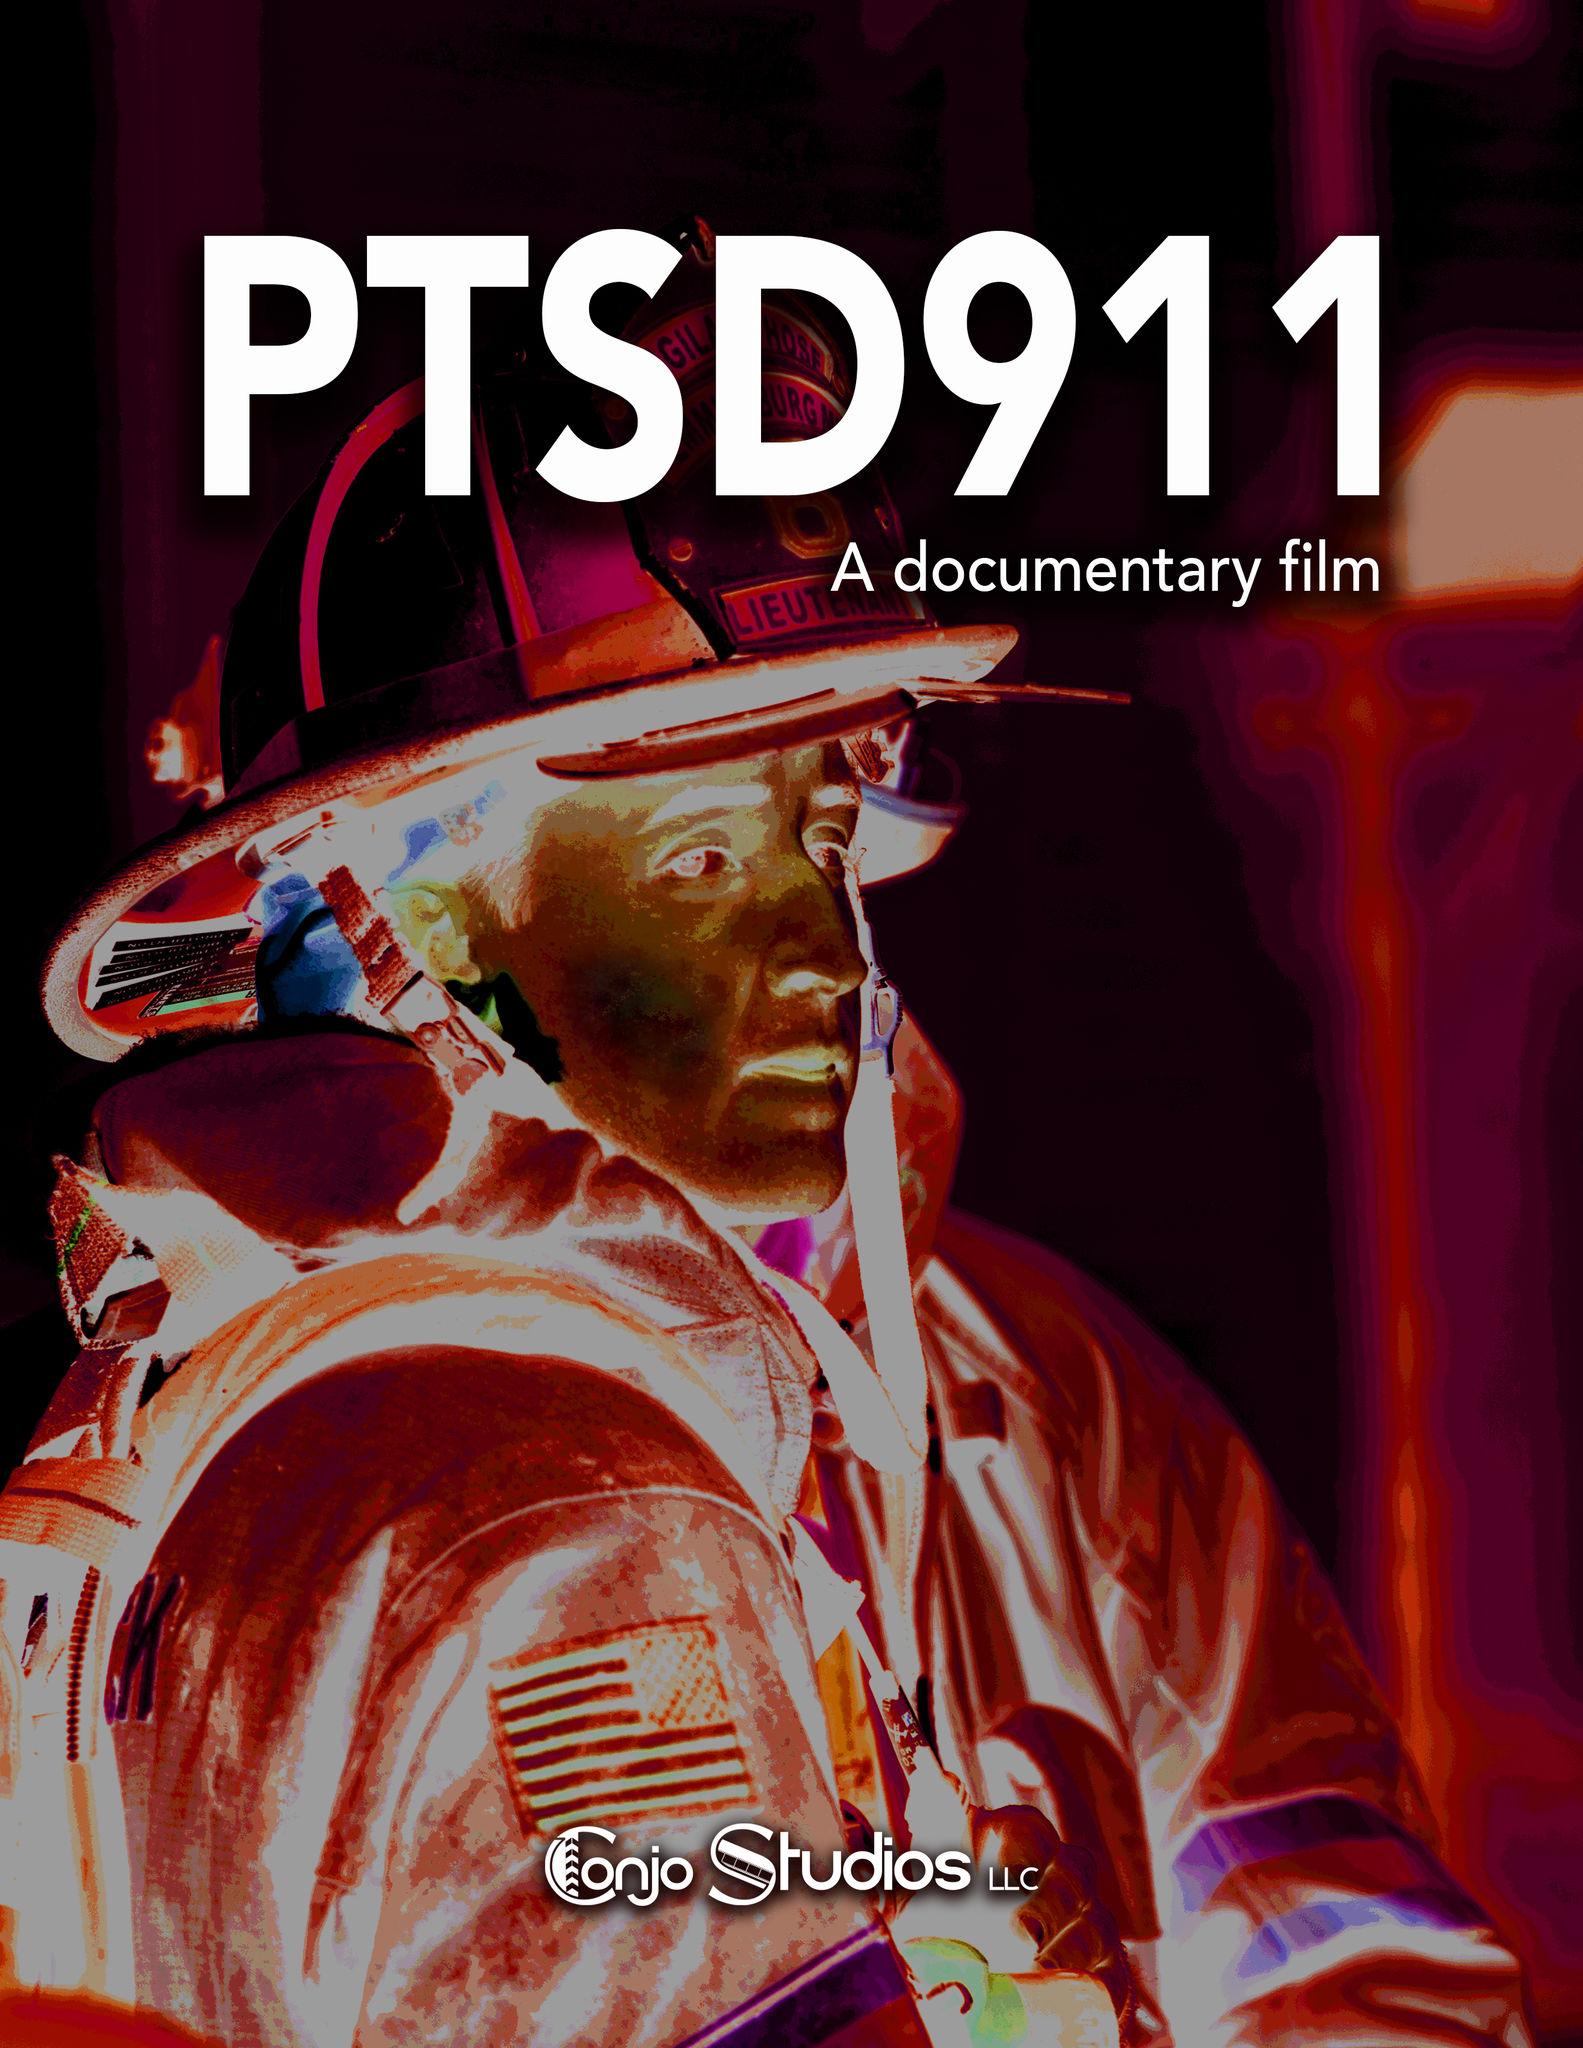 PTSD911